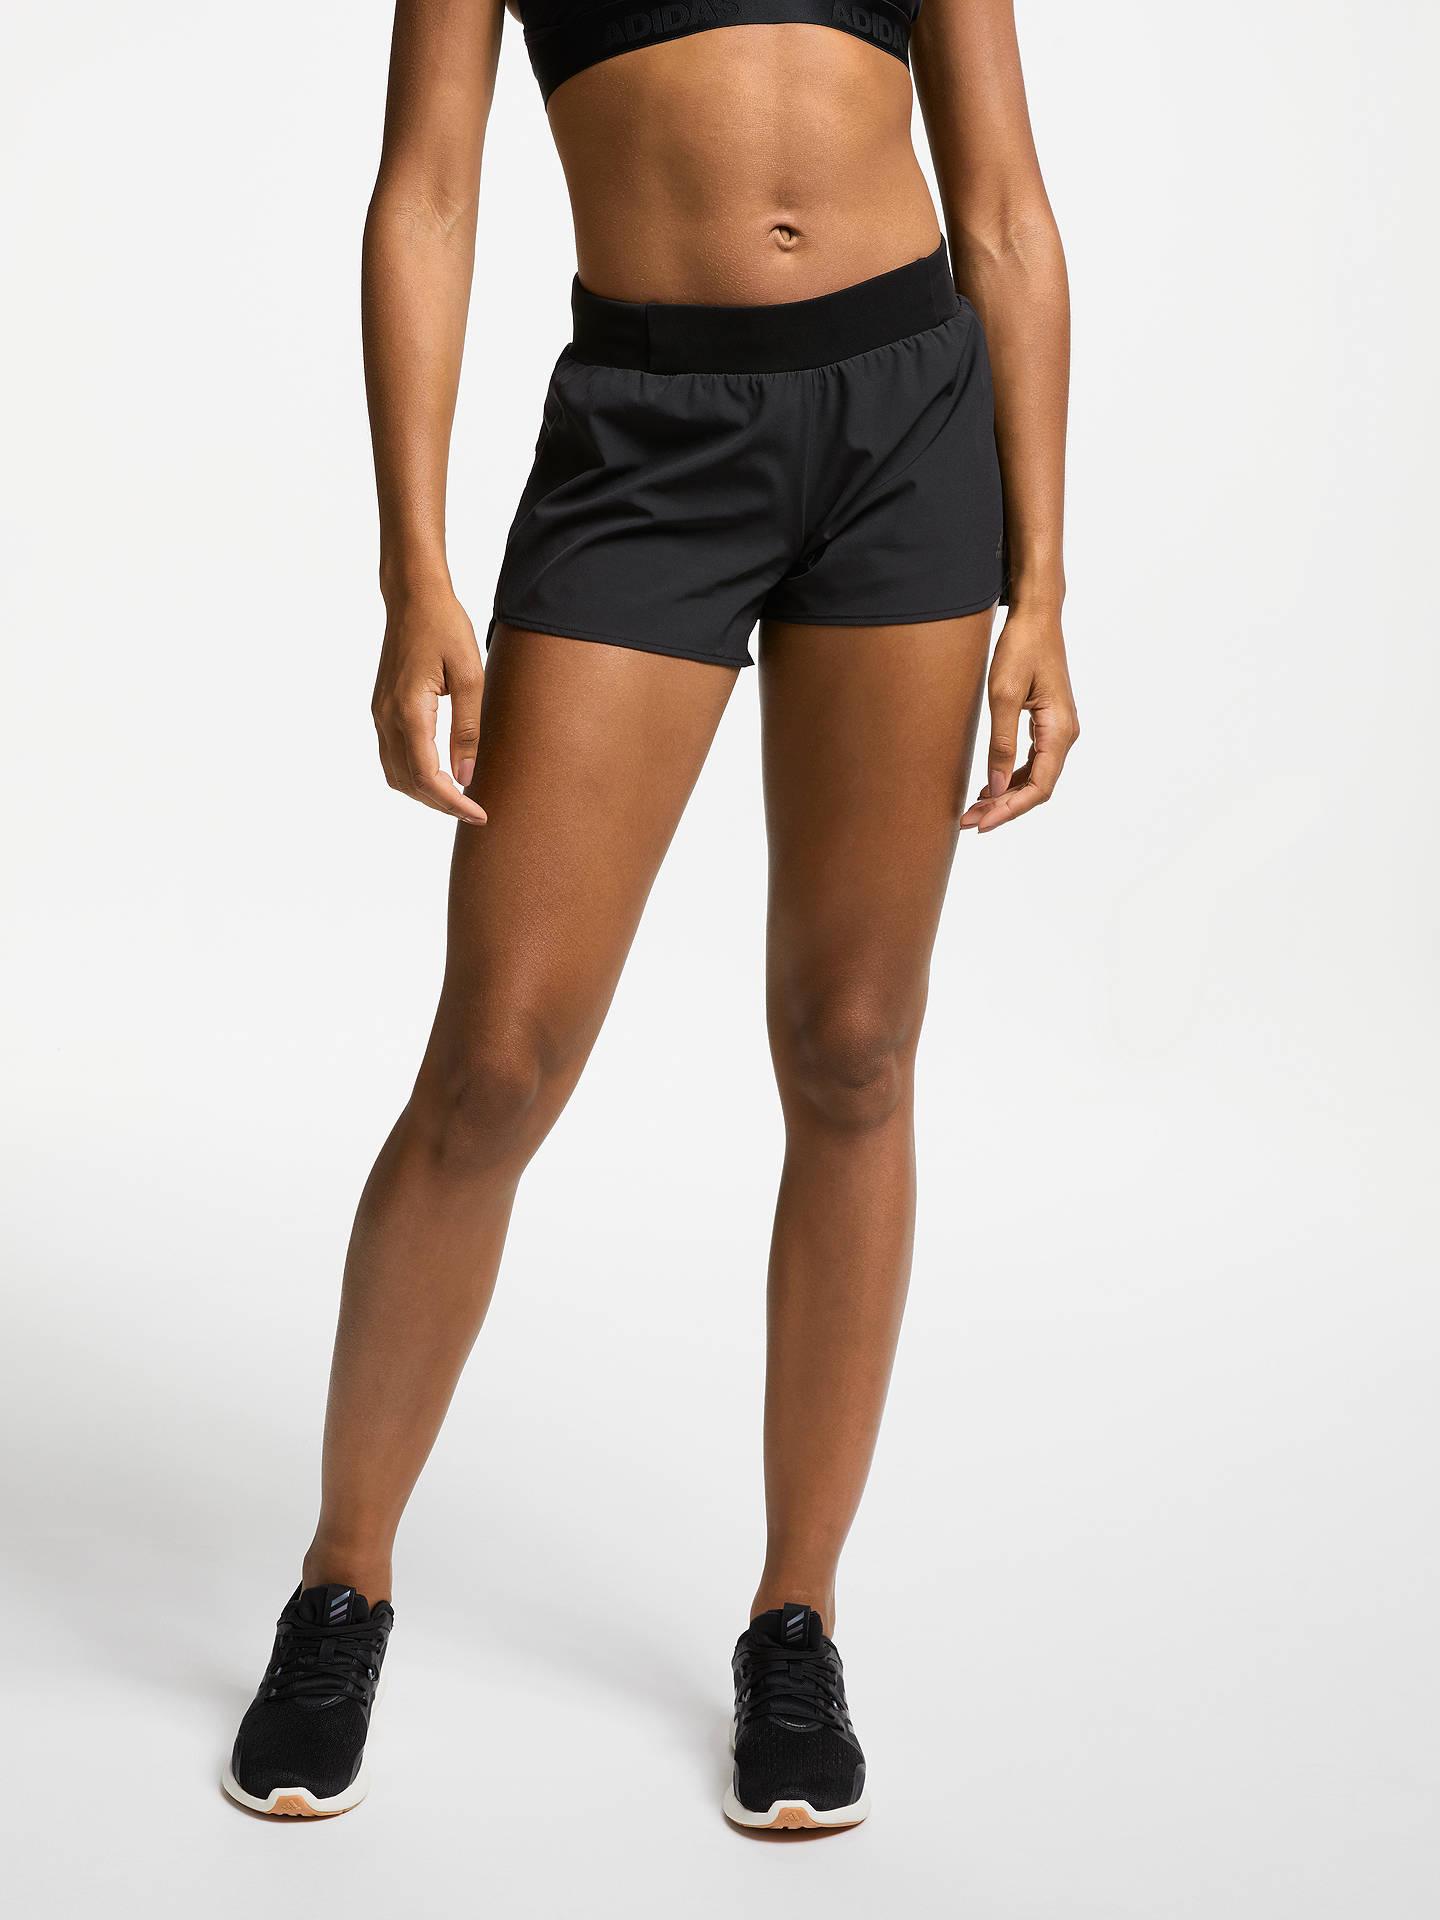 competitive price 7aba9 2f66b Buy adidas Supernova Saturday Running Shorts, Black, XS Online at  johnlewis.com ...